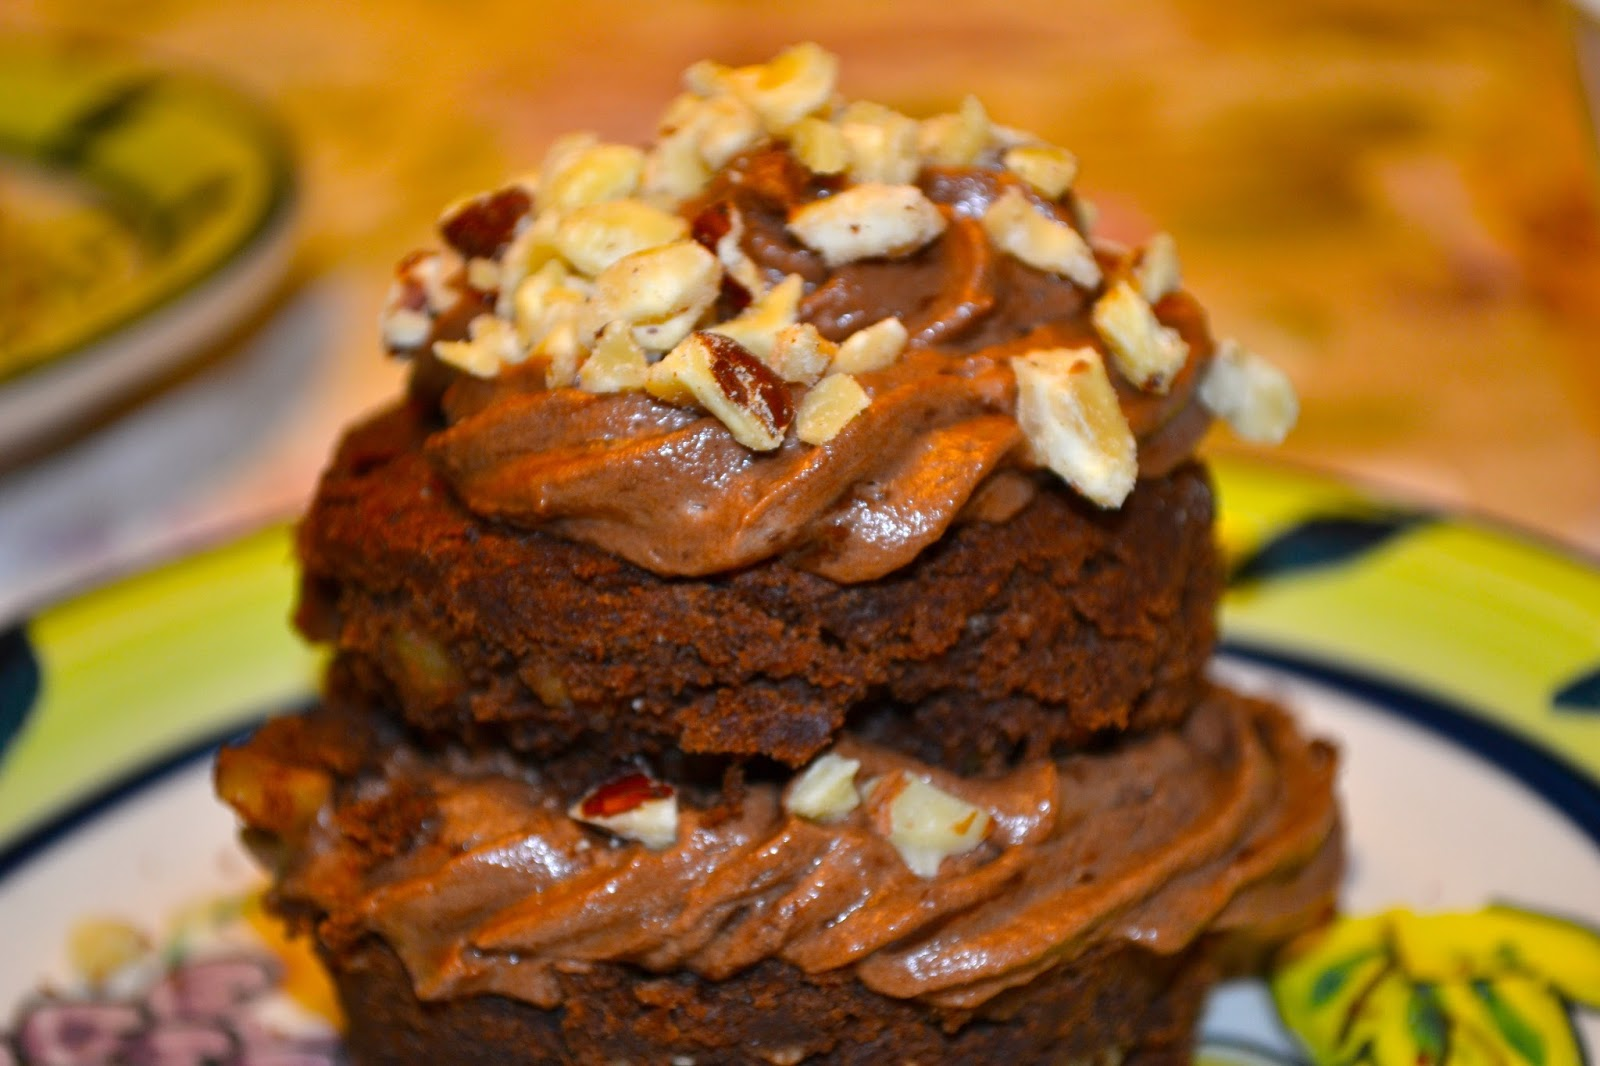 A Taste of Alaska: Chocolate Hazelnut Cake with Nutella Mousse